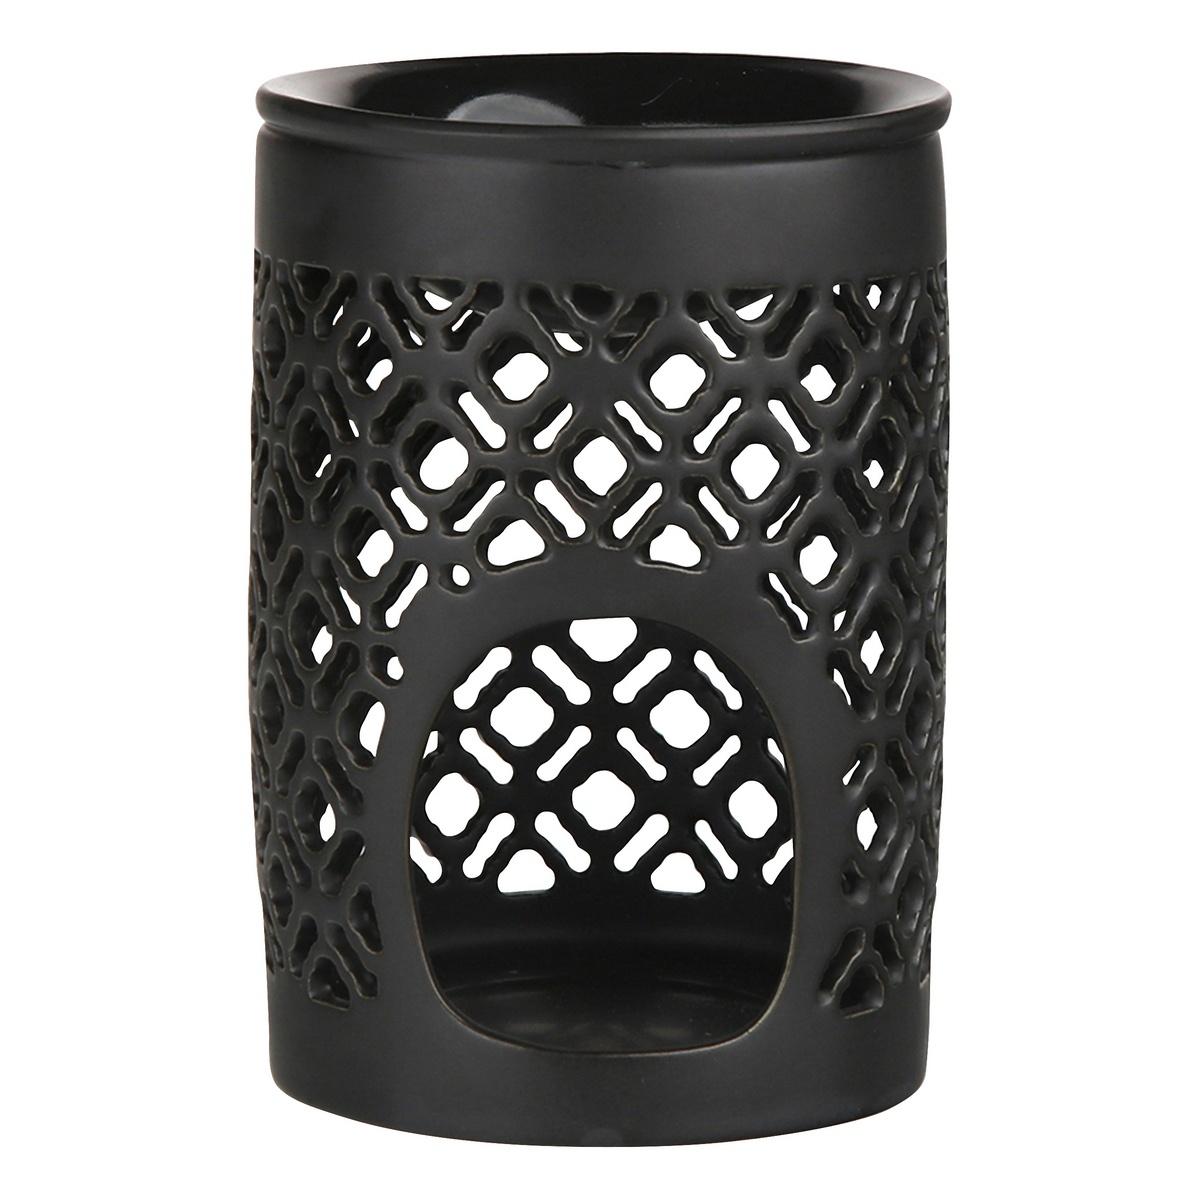 Altom Porcelánová aromalampa Beth 8,5 x 11,5 cm, černá